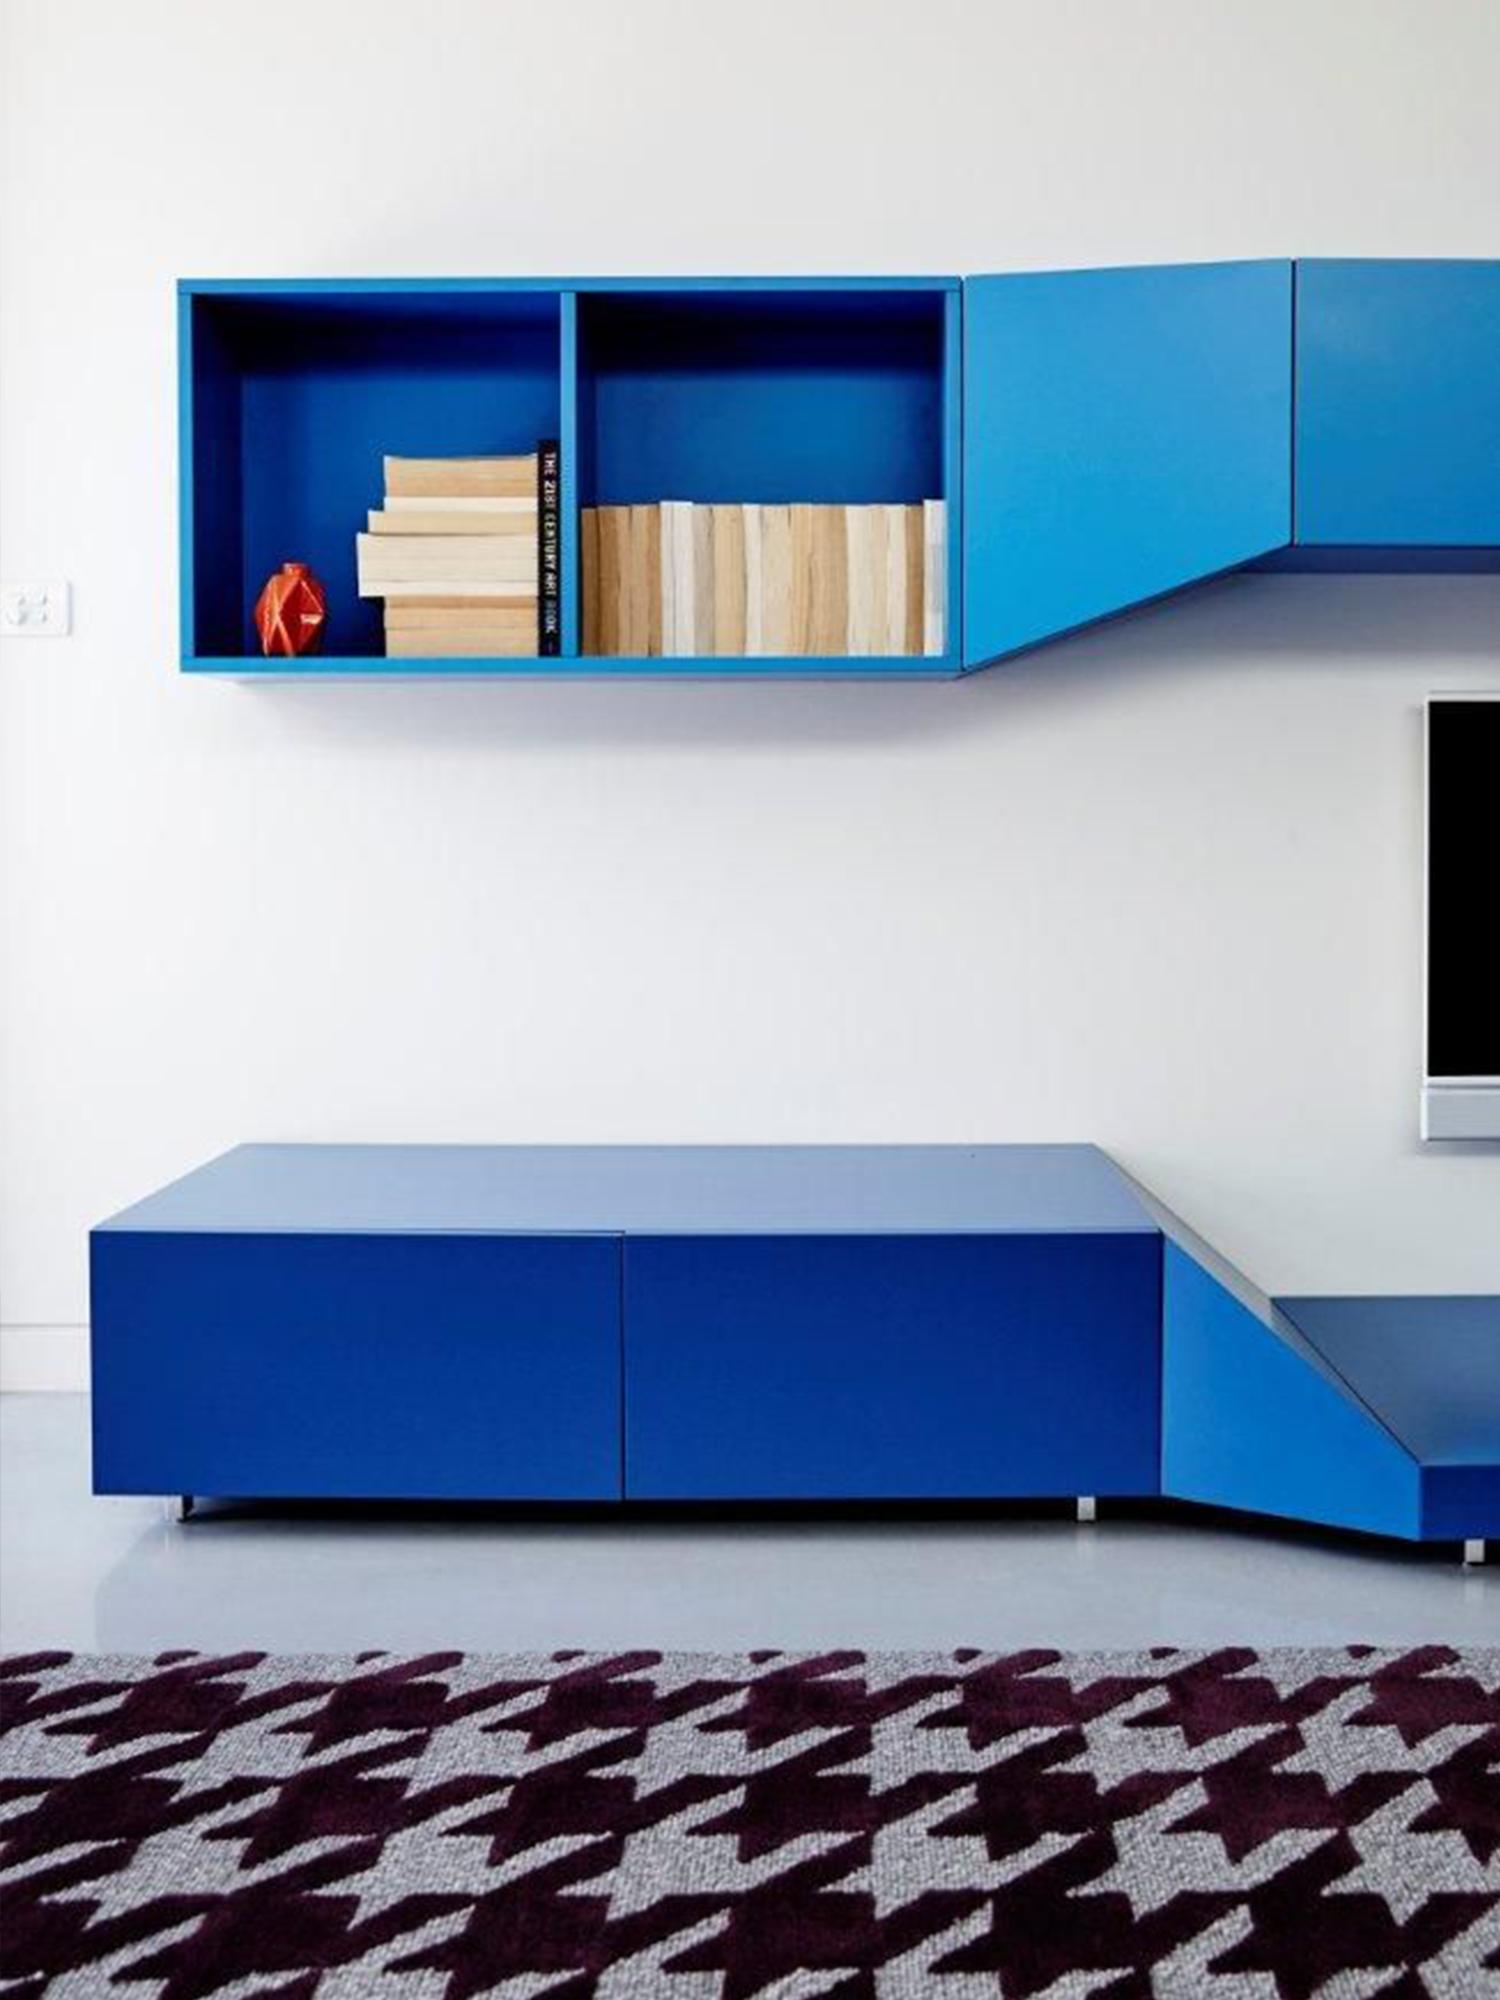 est living lucy marczyk true blue terrace 01 1